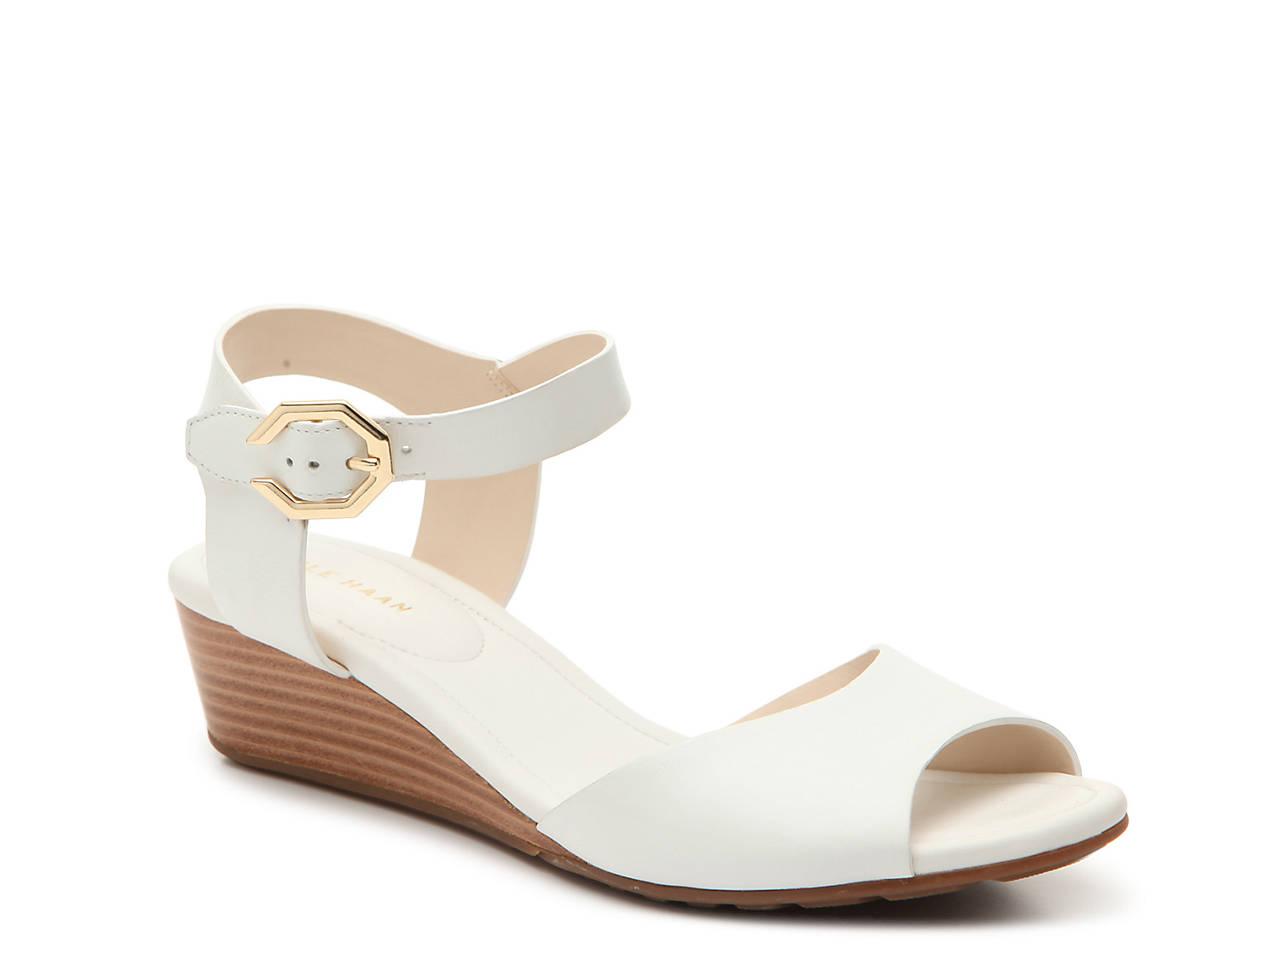 f60972e478f Cole Haan Everett Wedge Sandal Women s Shoes